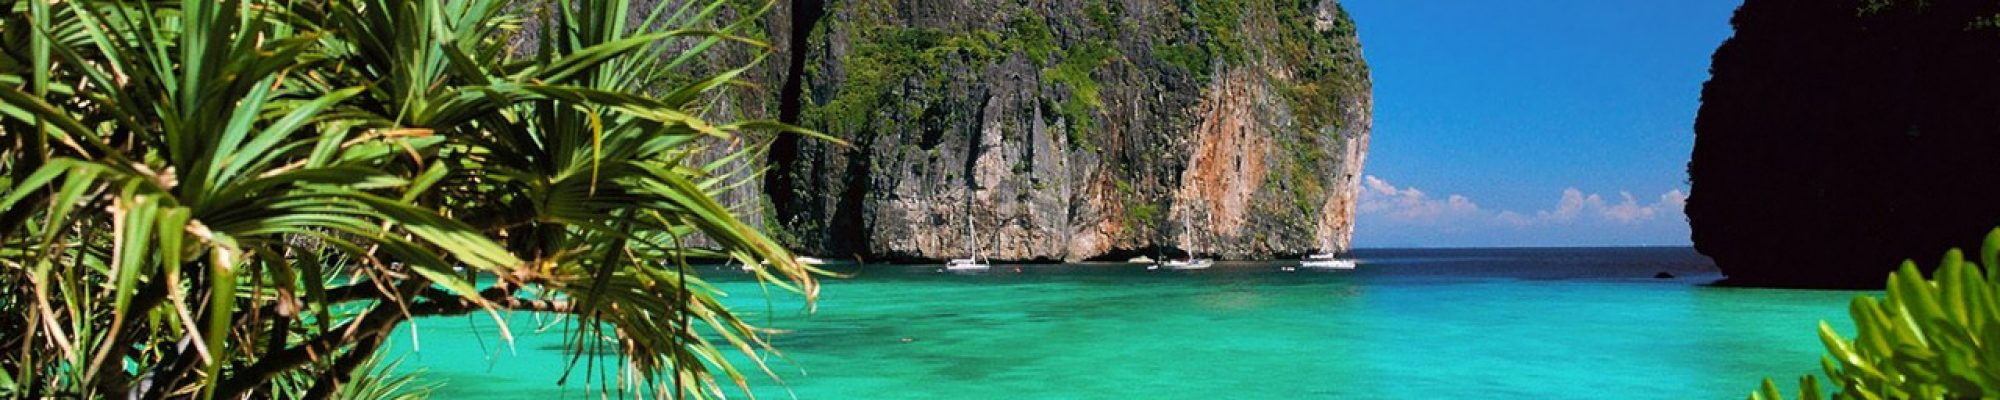 thailandia-ko-tao